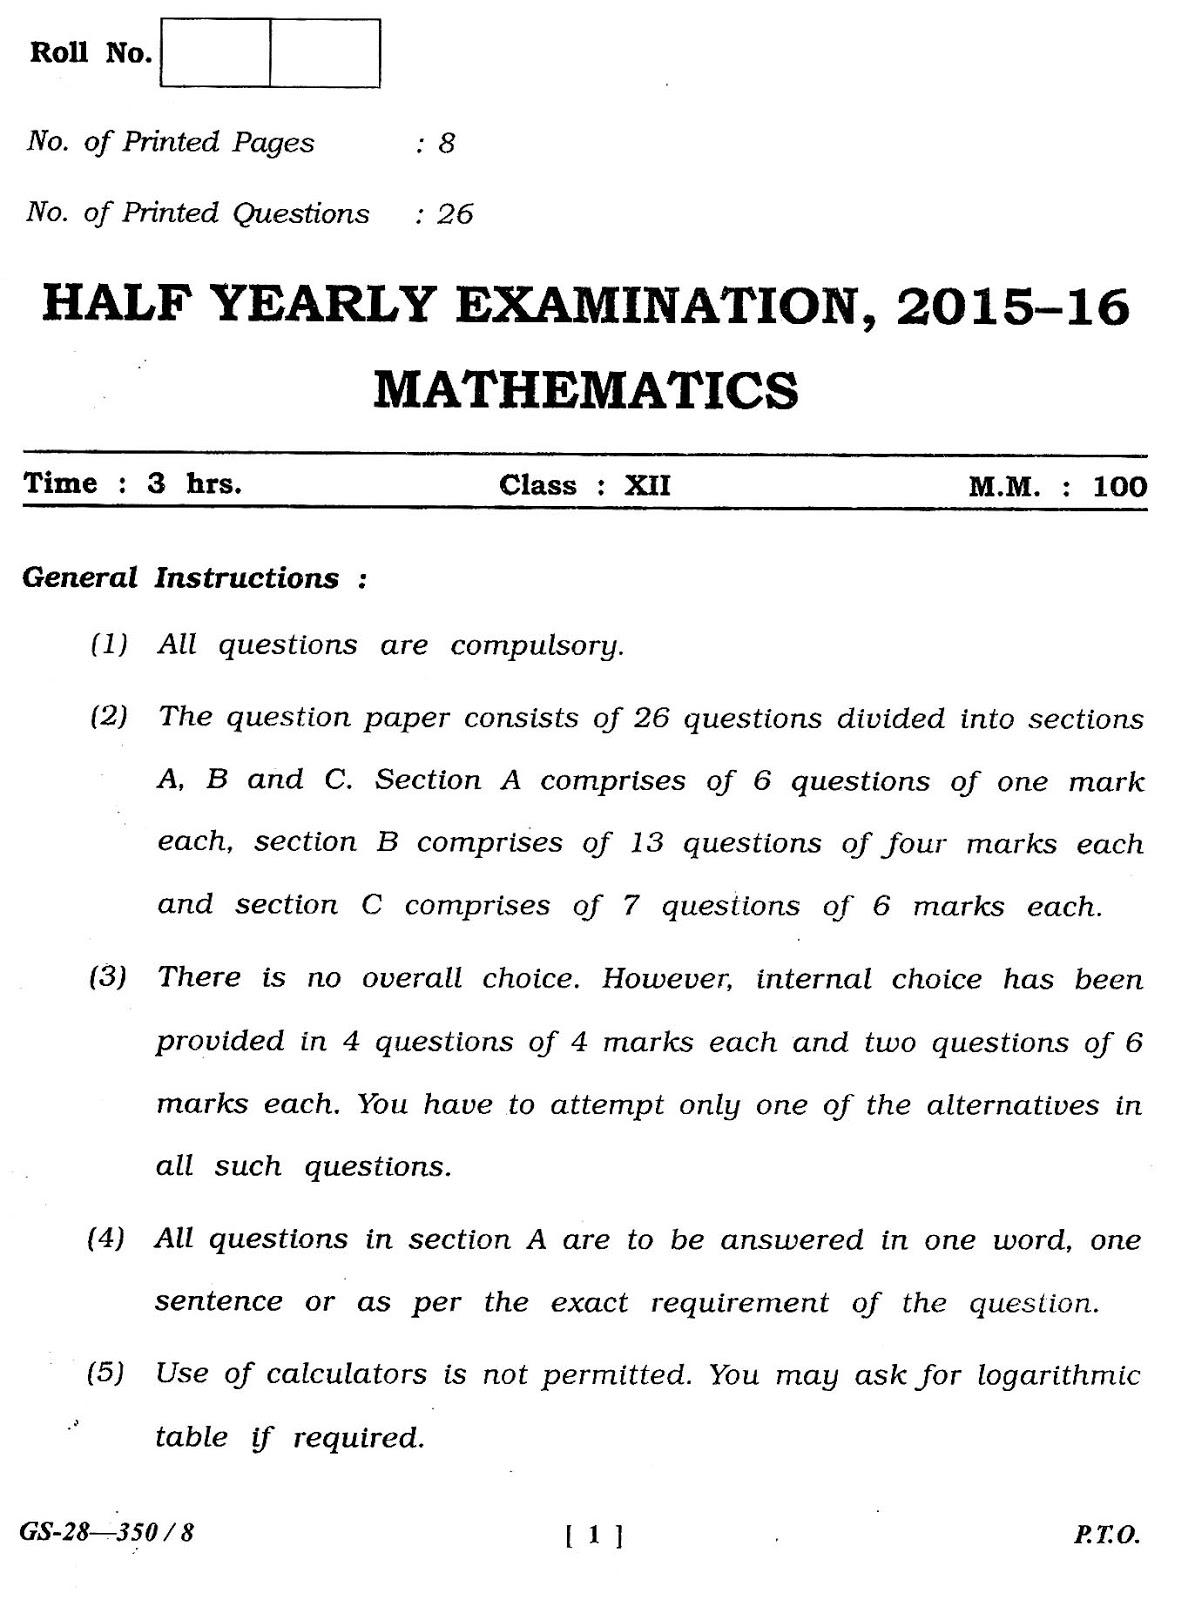 Class Xii Mathematics Modren School Barakhamba Sa 1